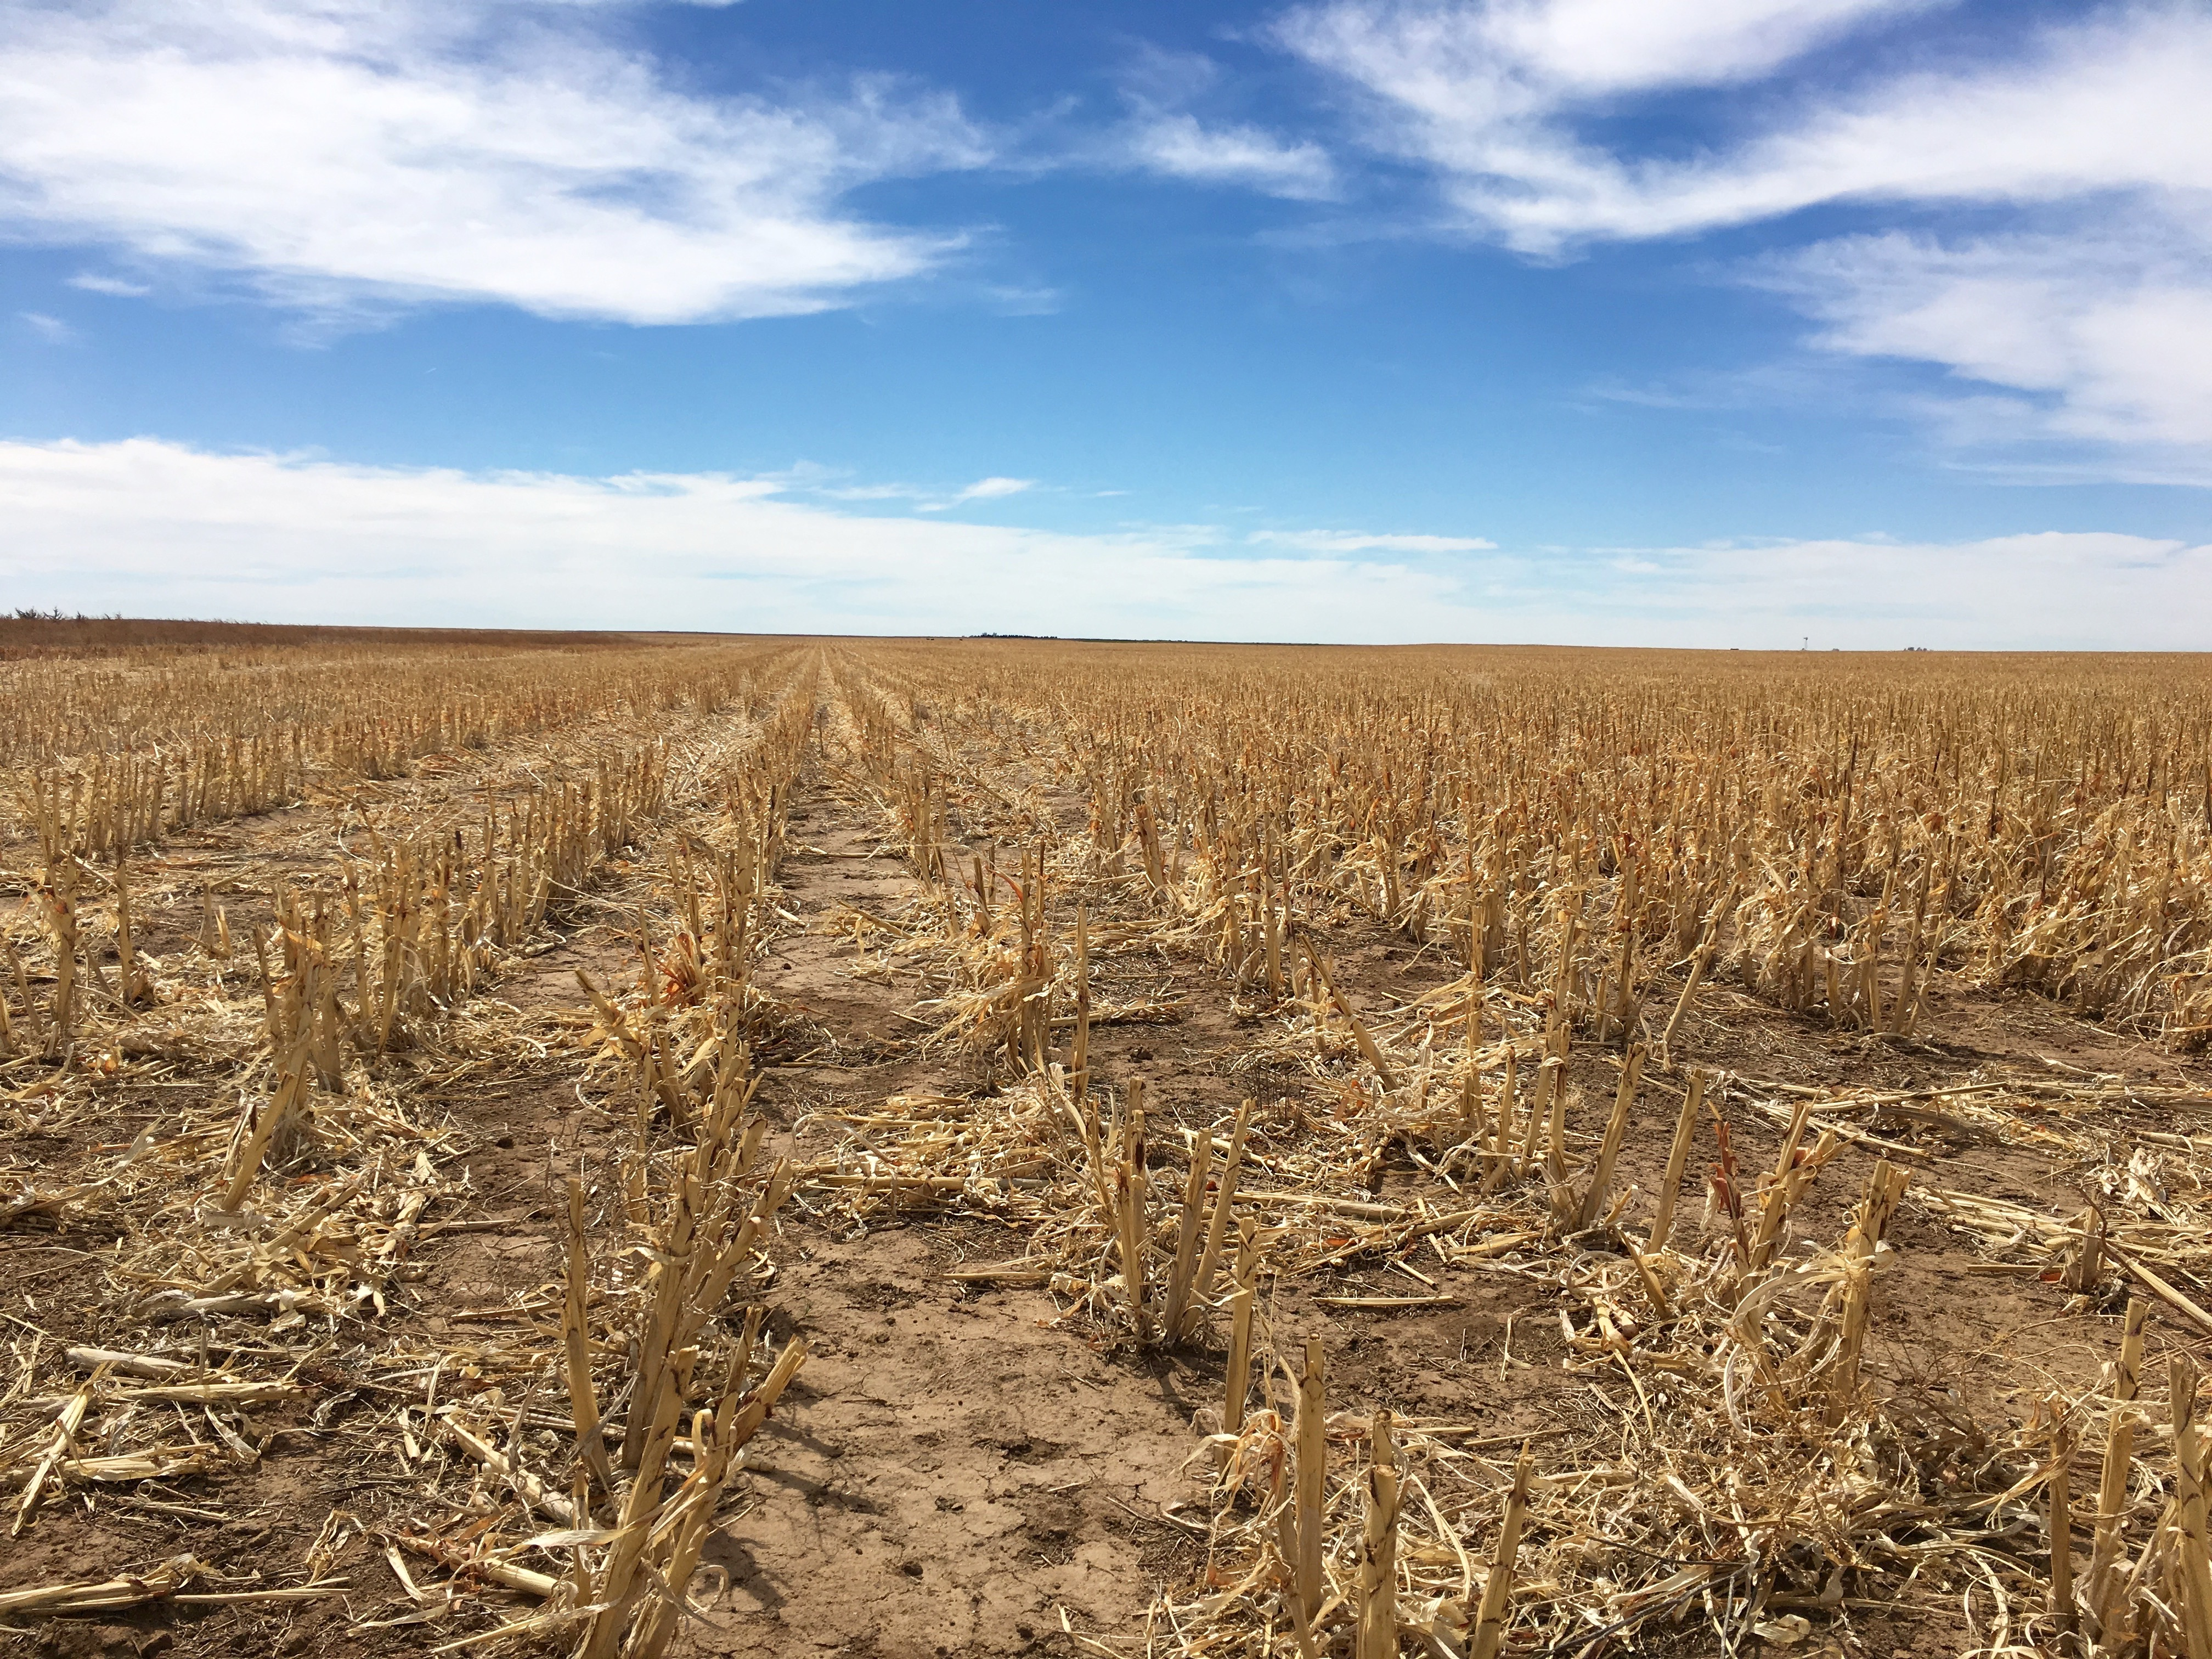 Baca County, Colorado Land for Sale